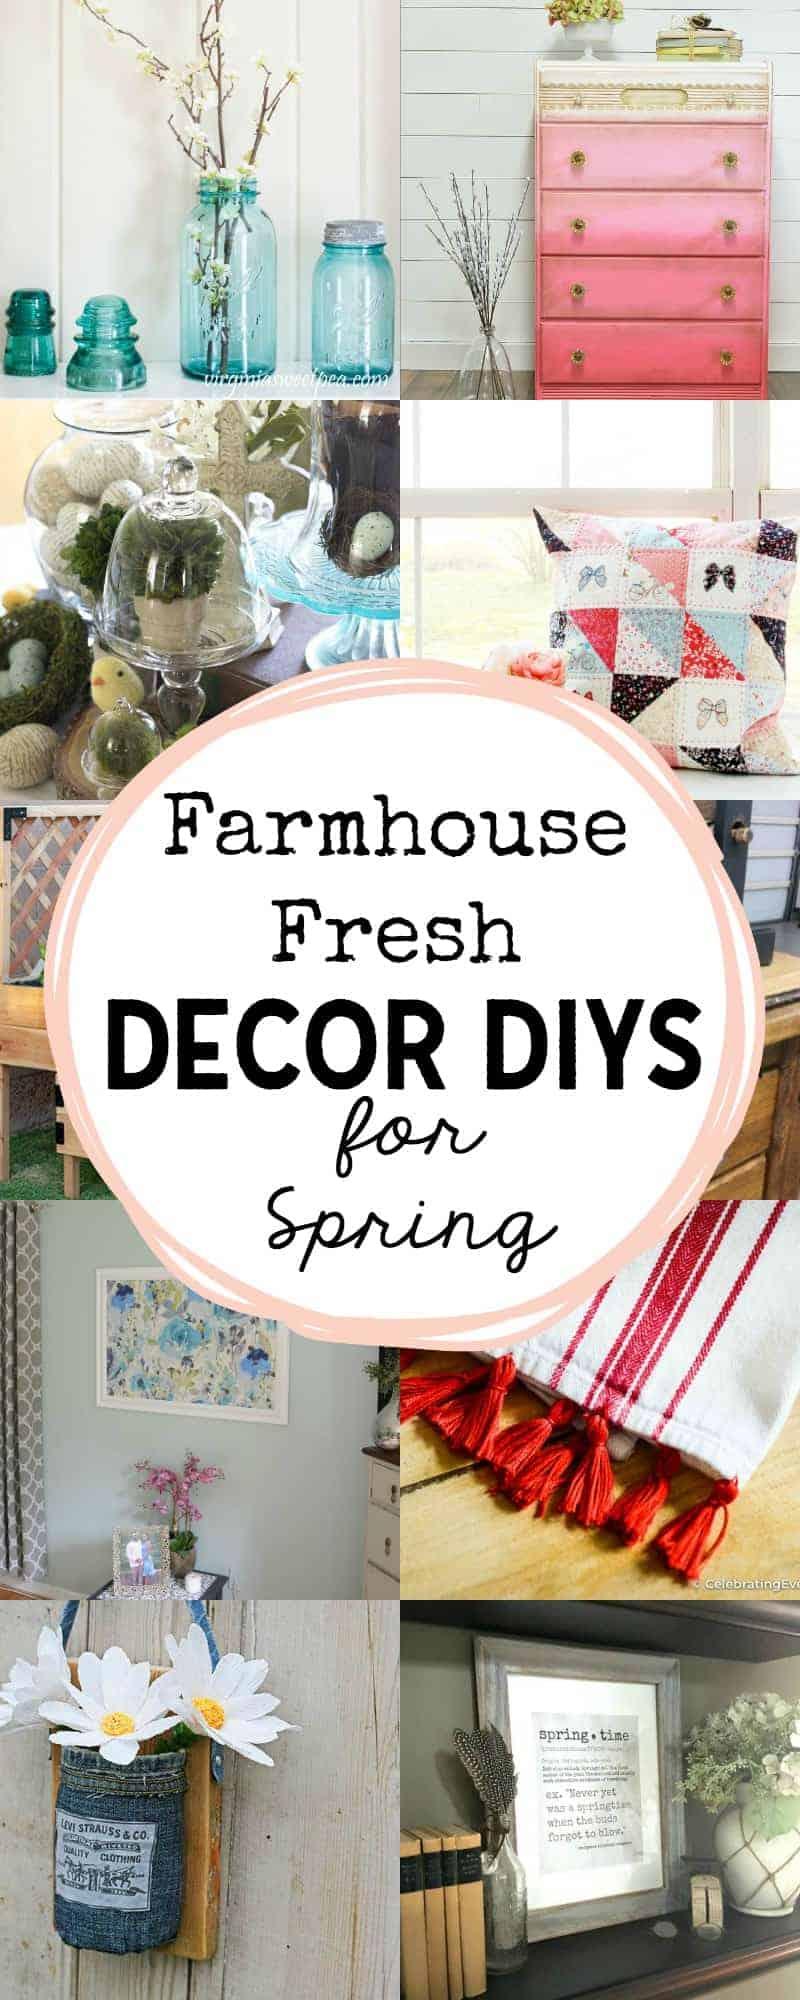 photos of farmhouse fresh home decor DIYs in a long pinterest style collage